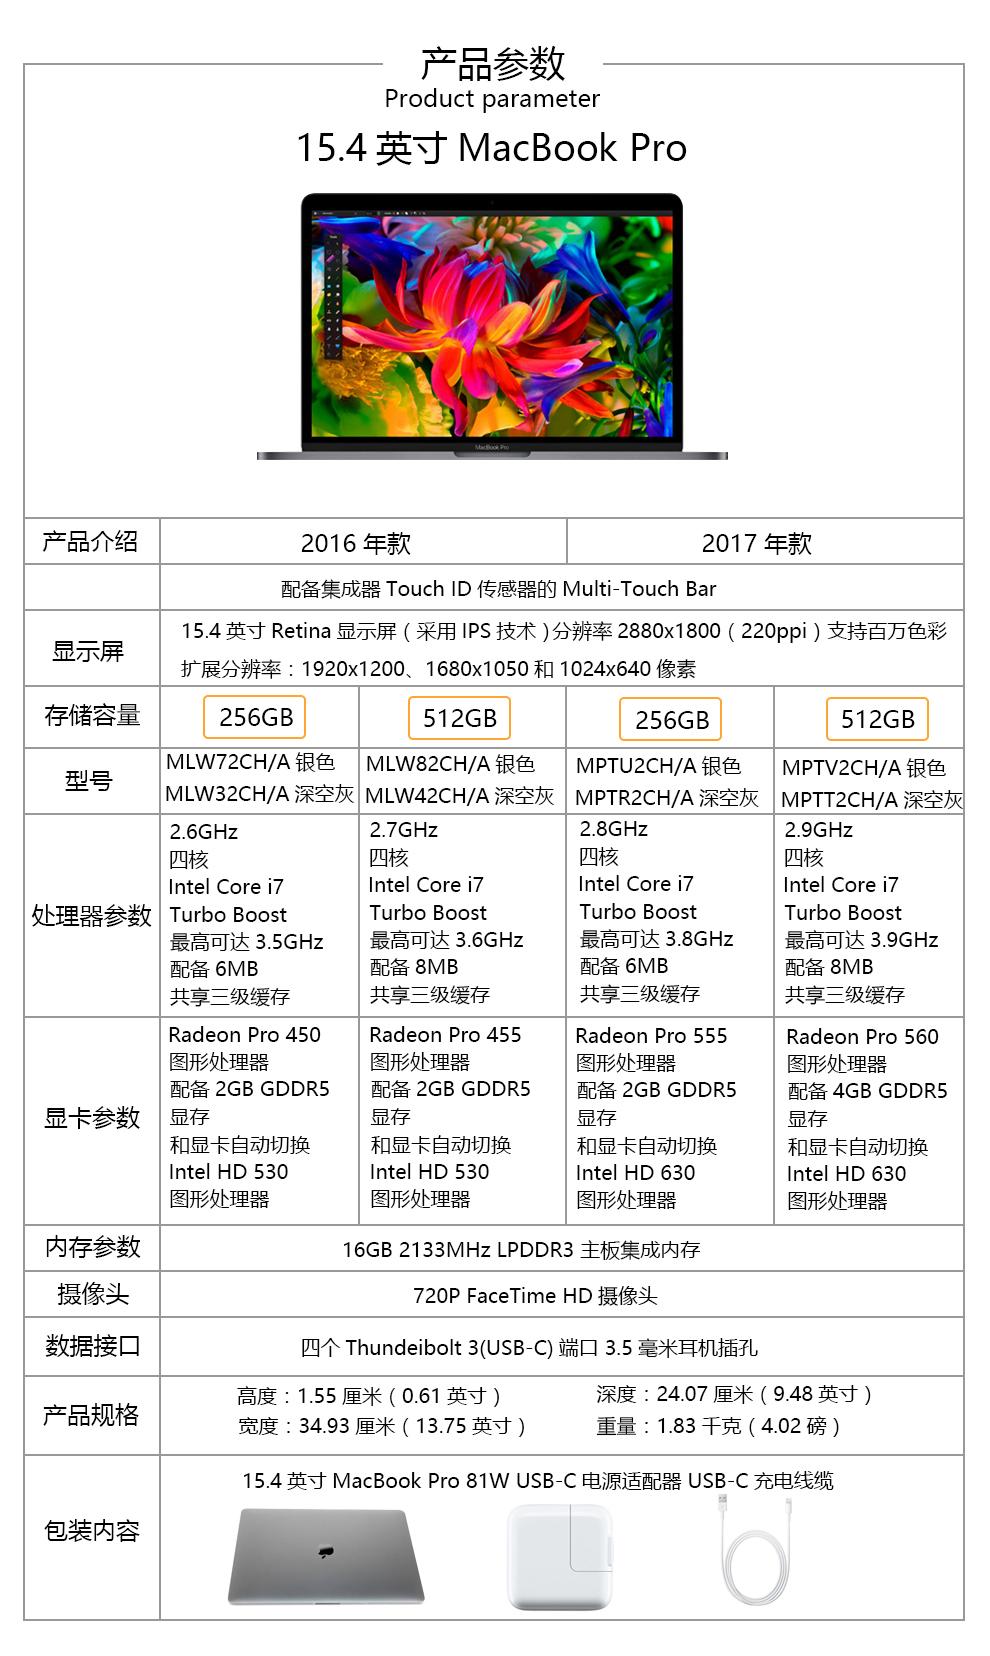 Apple MacBook Pro 笔记本电脑 15.4英寸 2016款 详情页